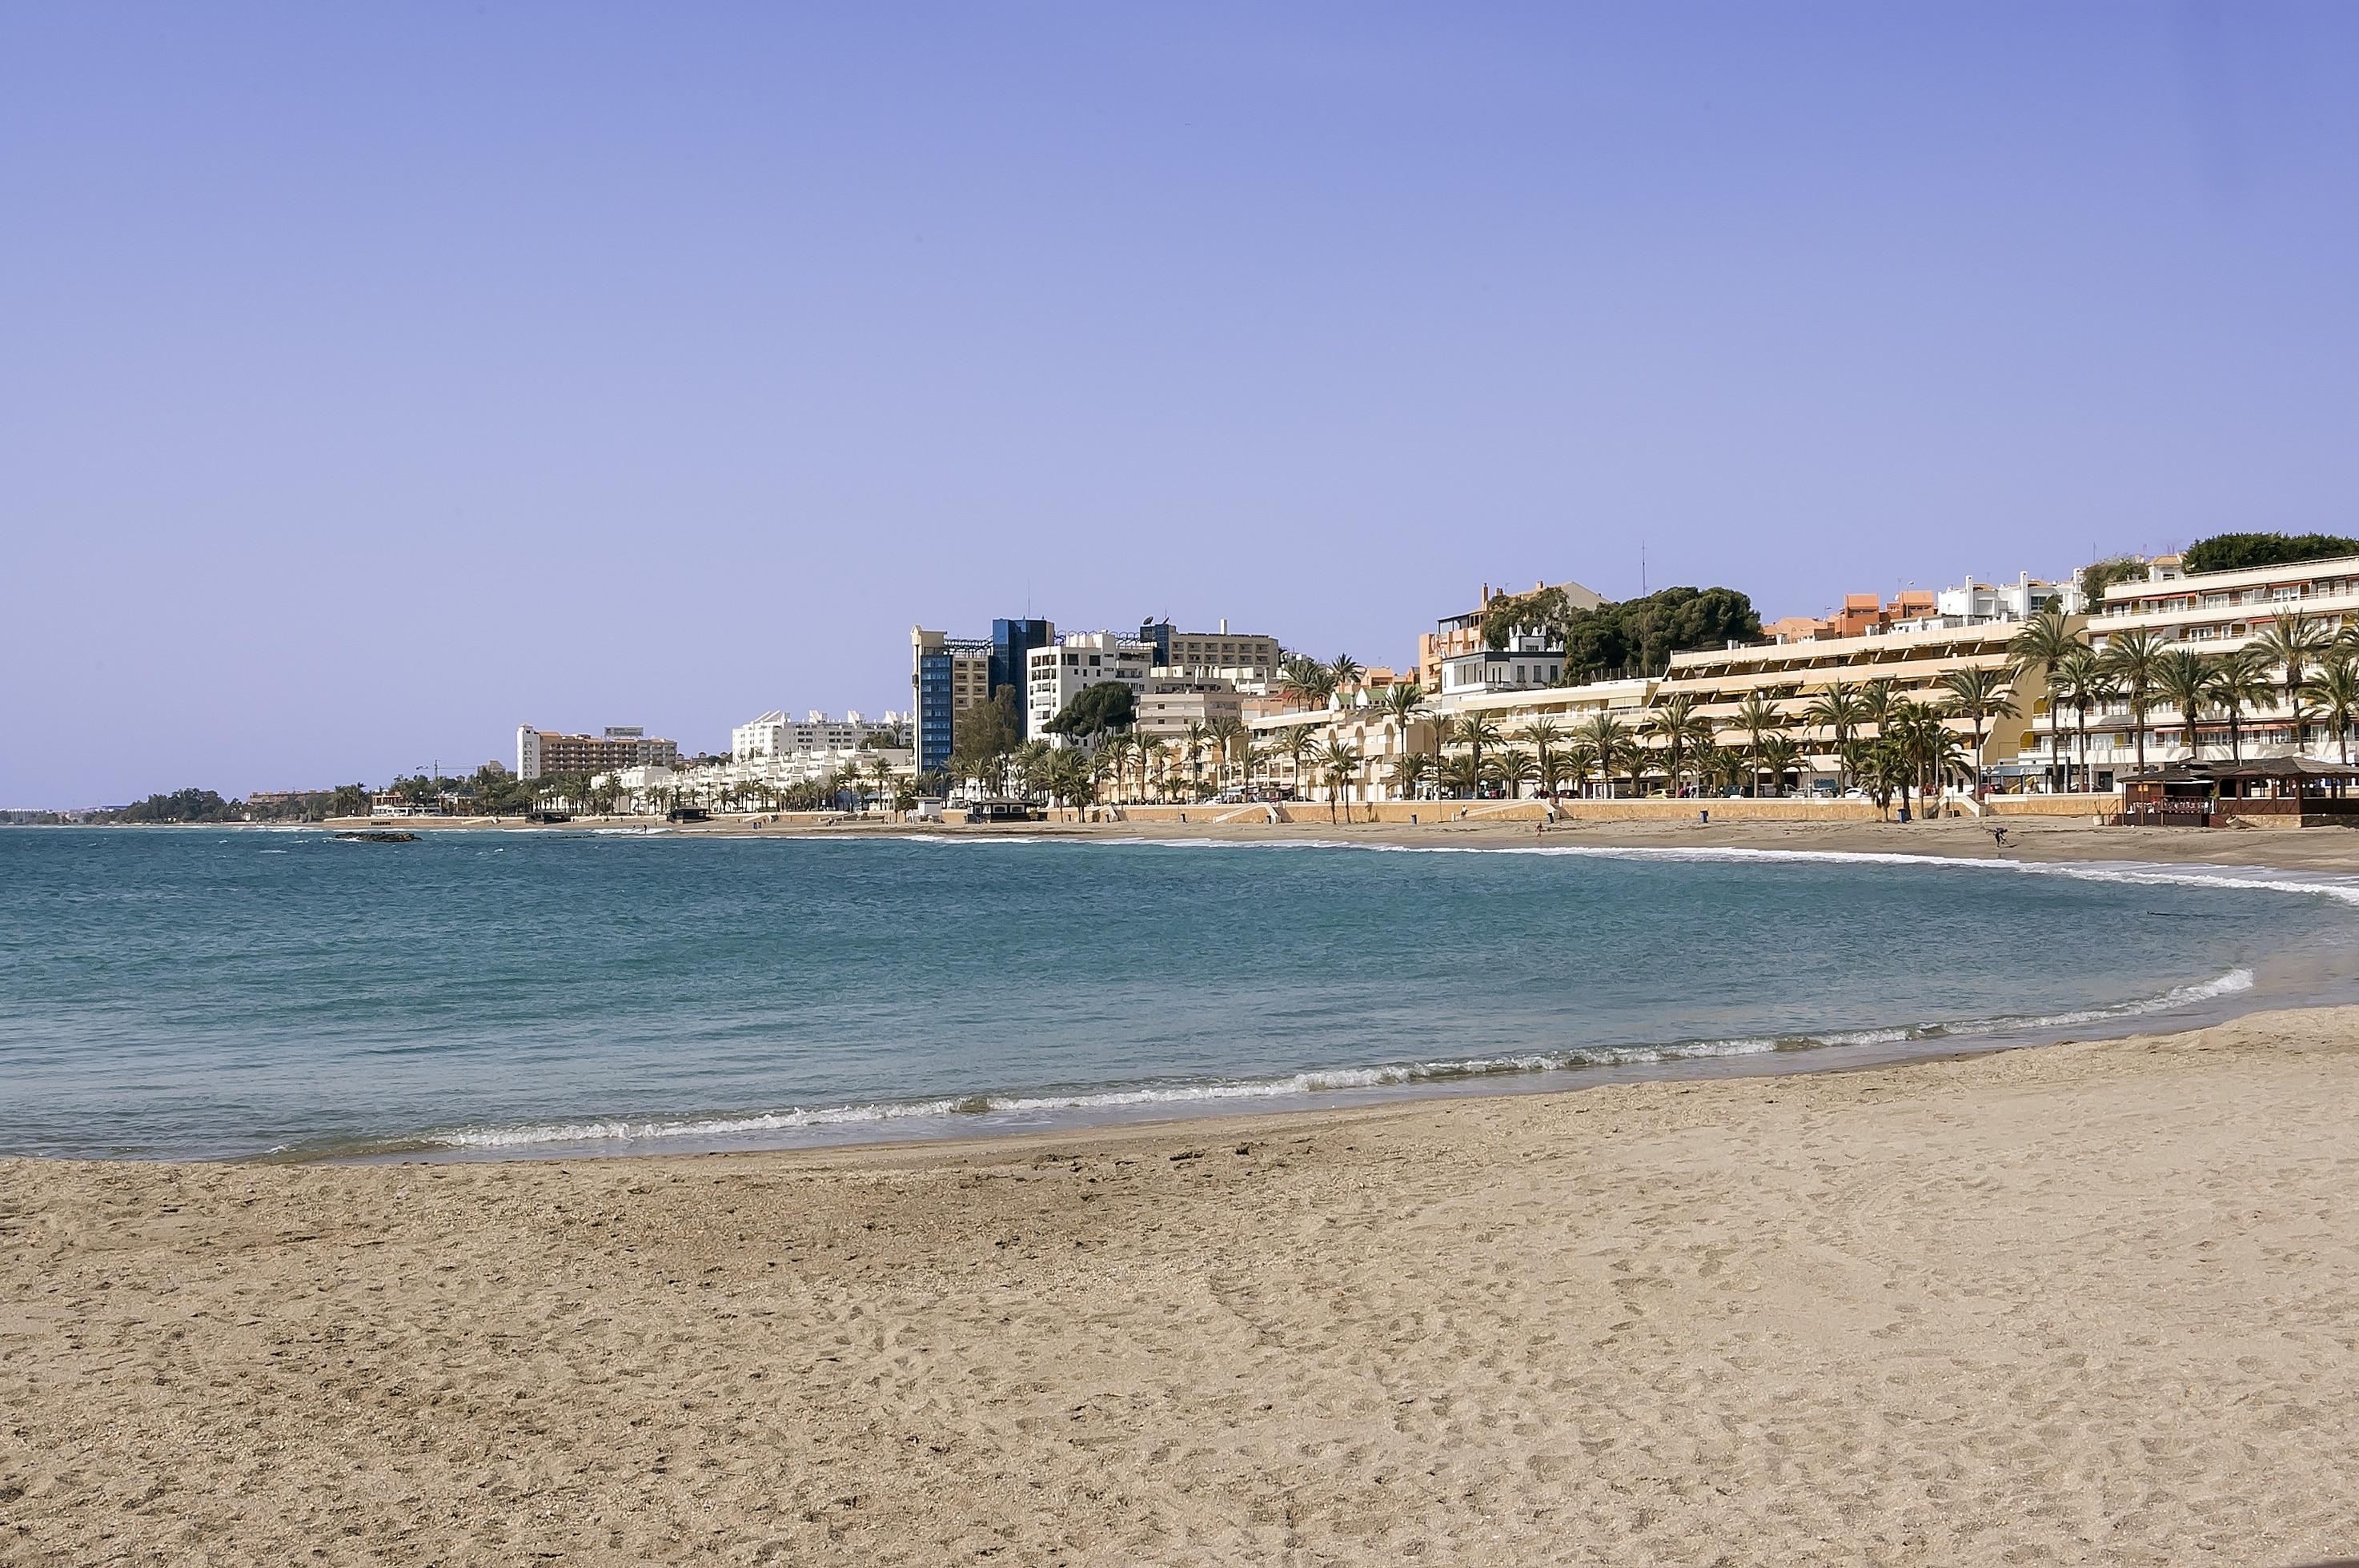 Aguadulce, Roquetas de Mar, Andalusia, Spain